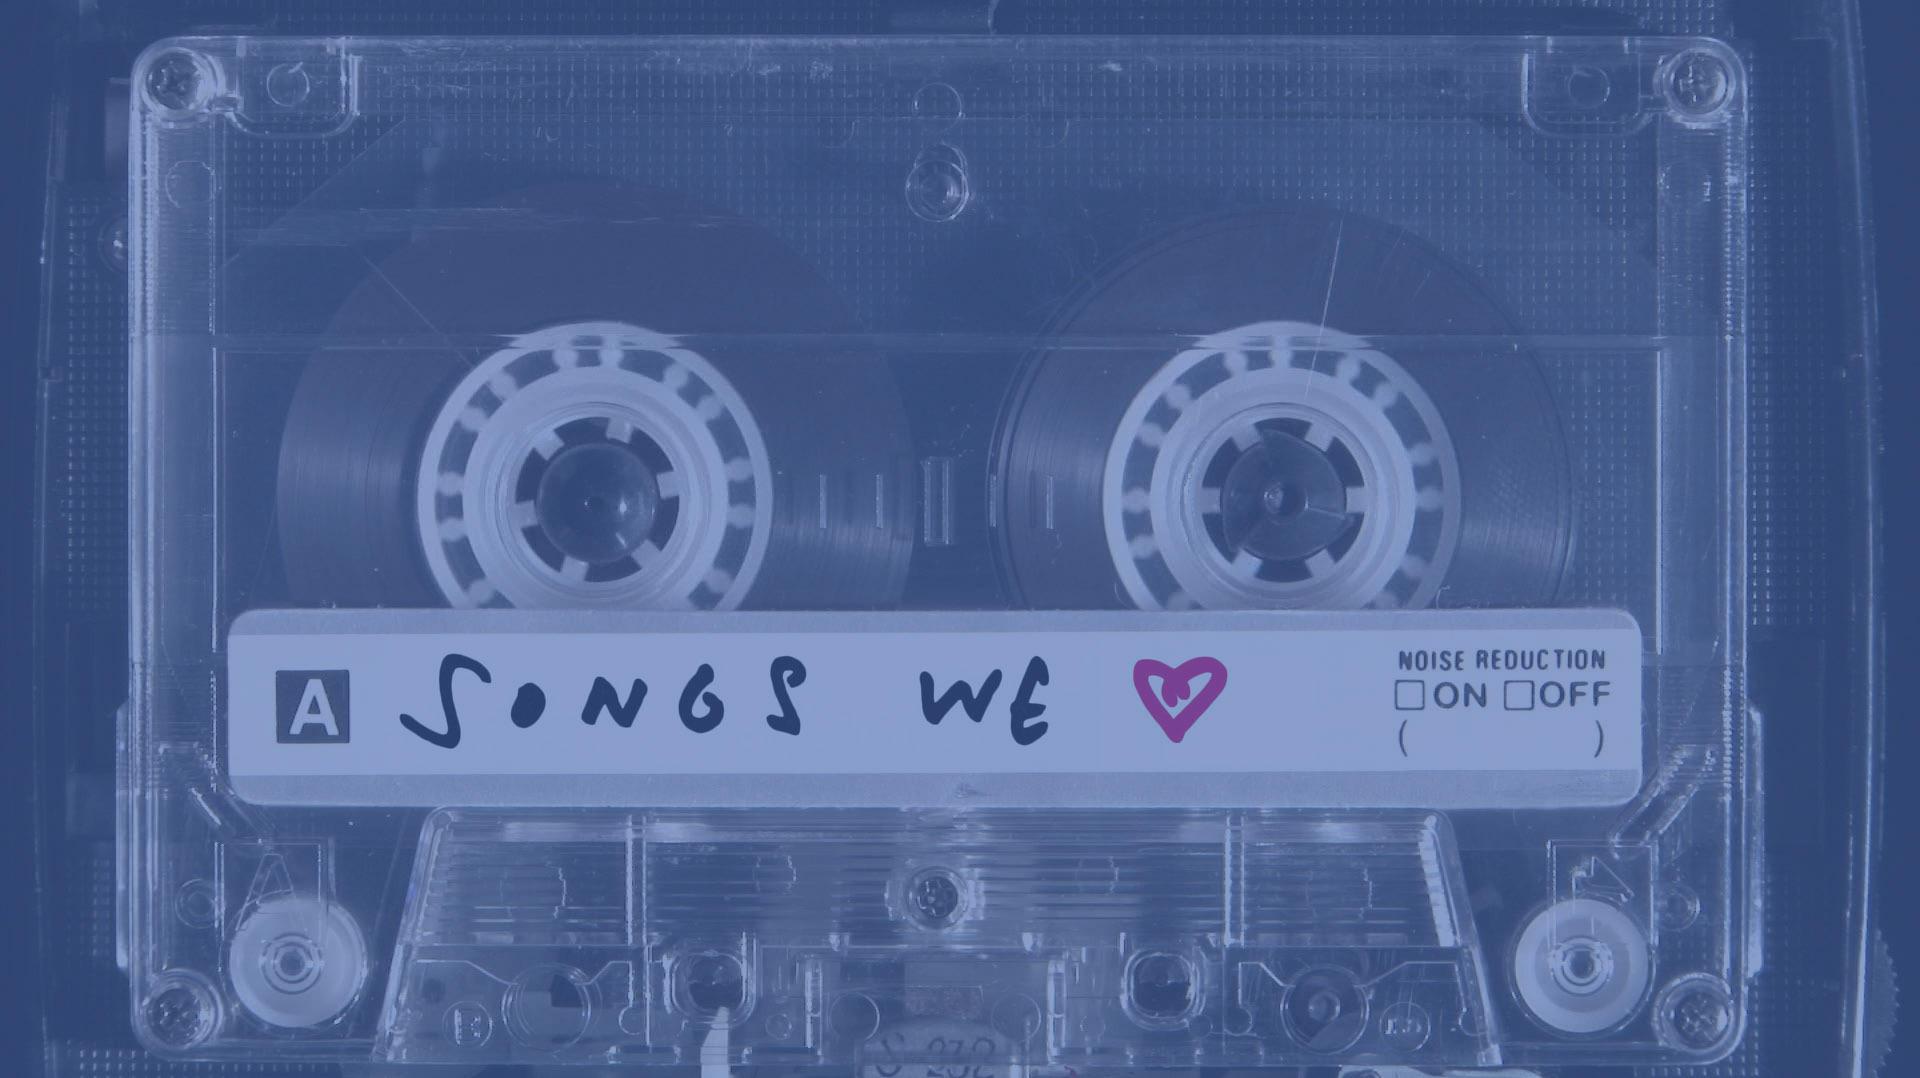 The Complete List Npr Musics Favorite Songs Of 2015 Kuvokvjz